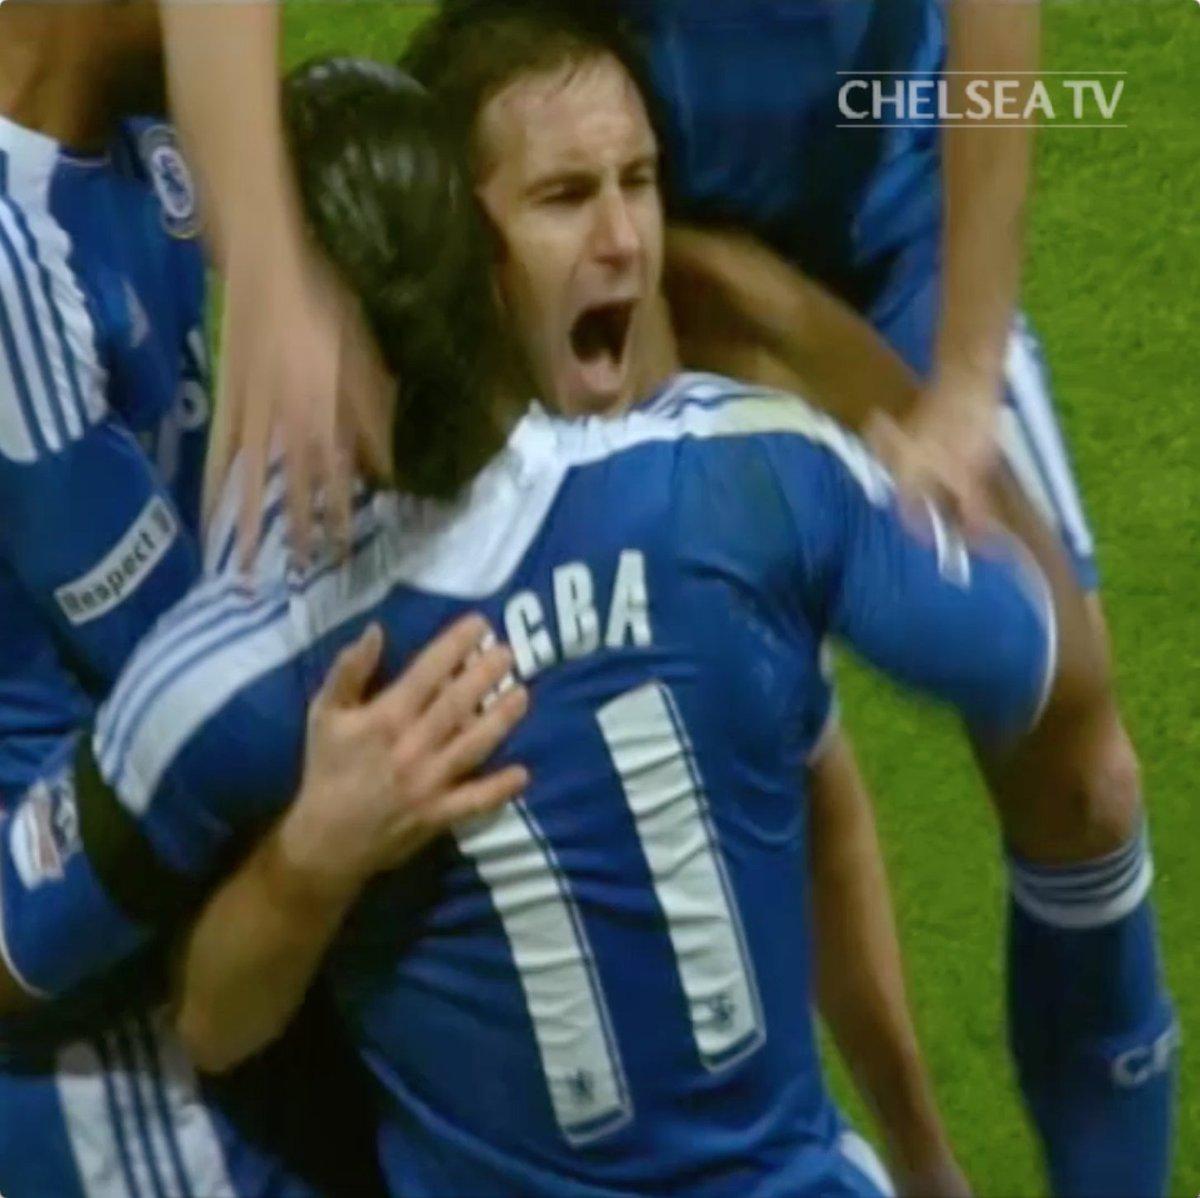 Chelsea FC Português's photo on Da Inglaterra